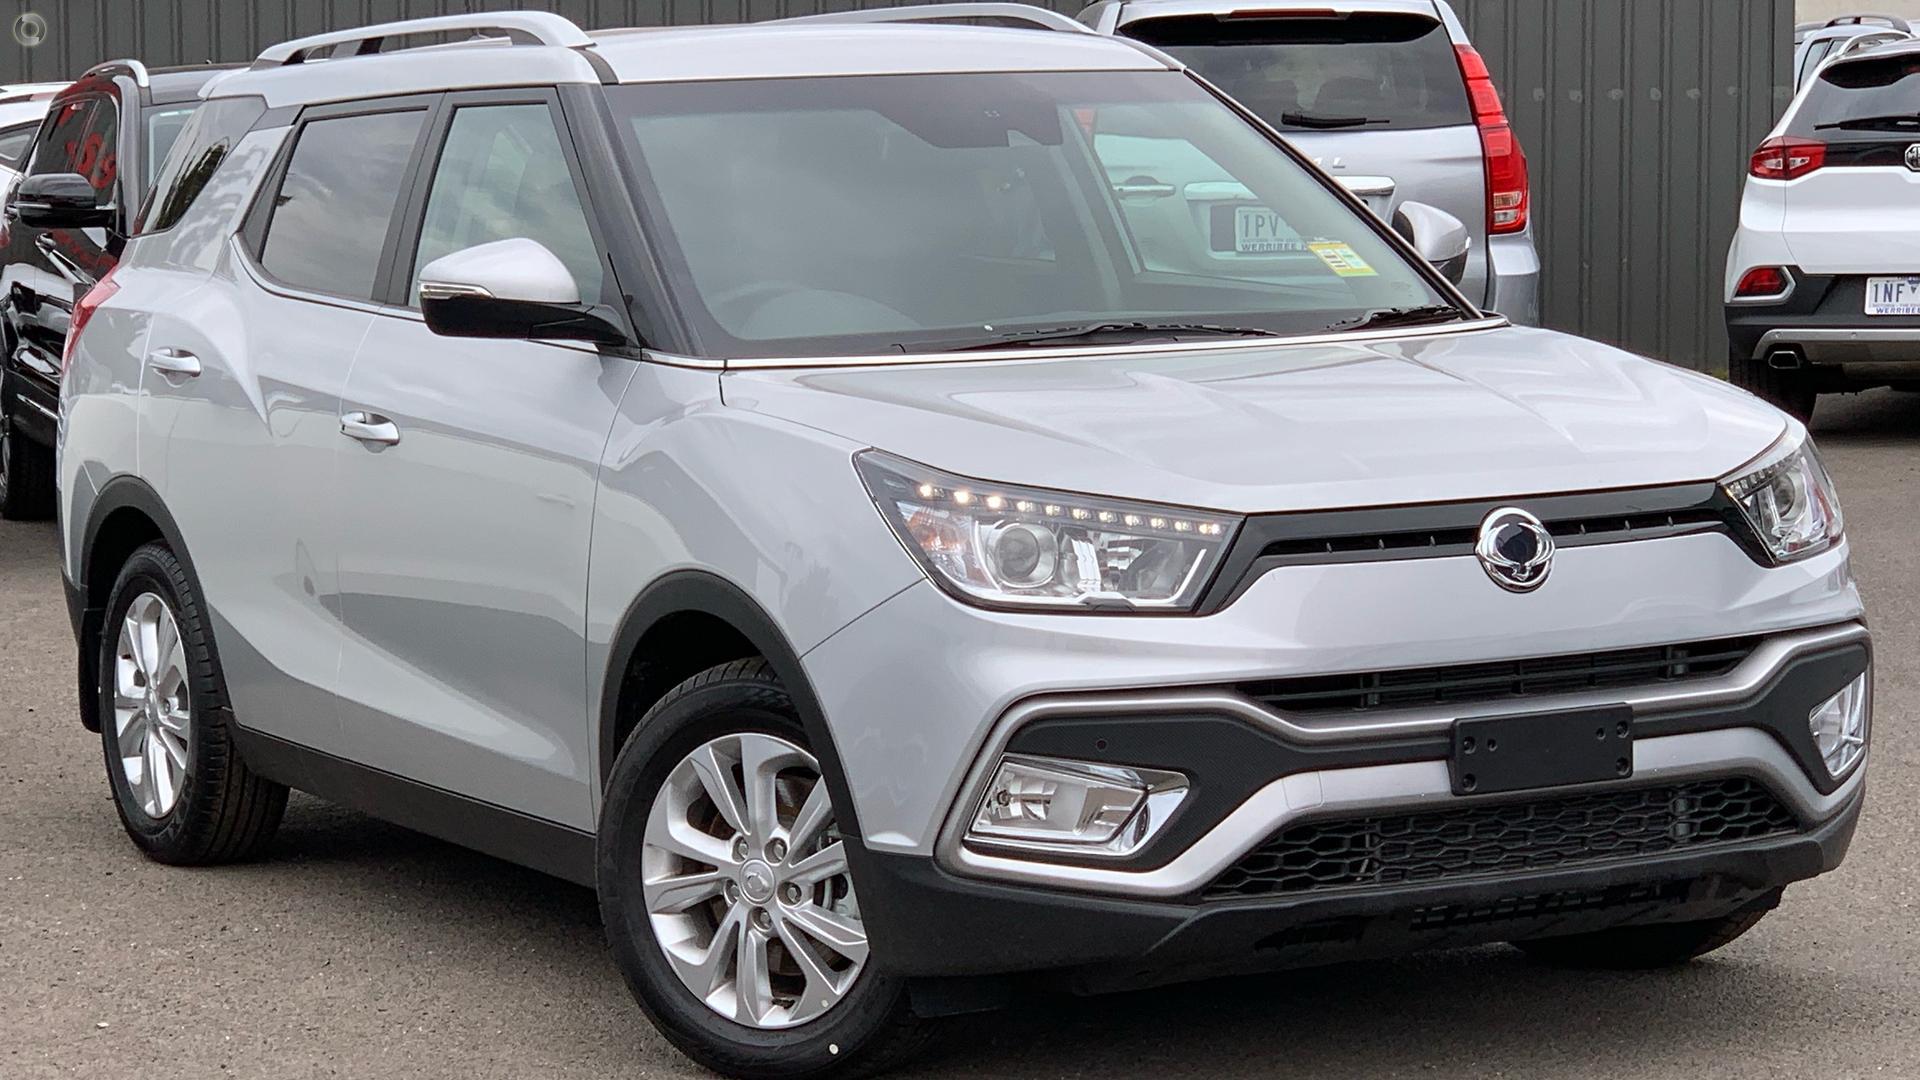 2019 SsangYong Tivoli XLV ELX X100